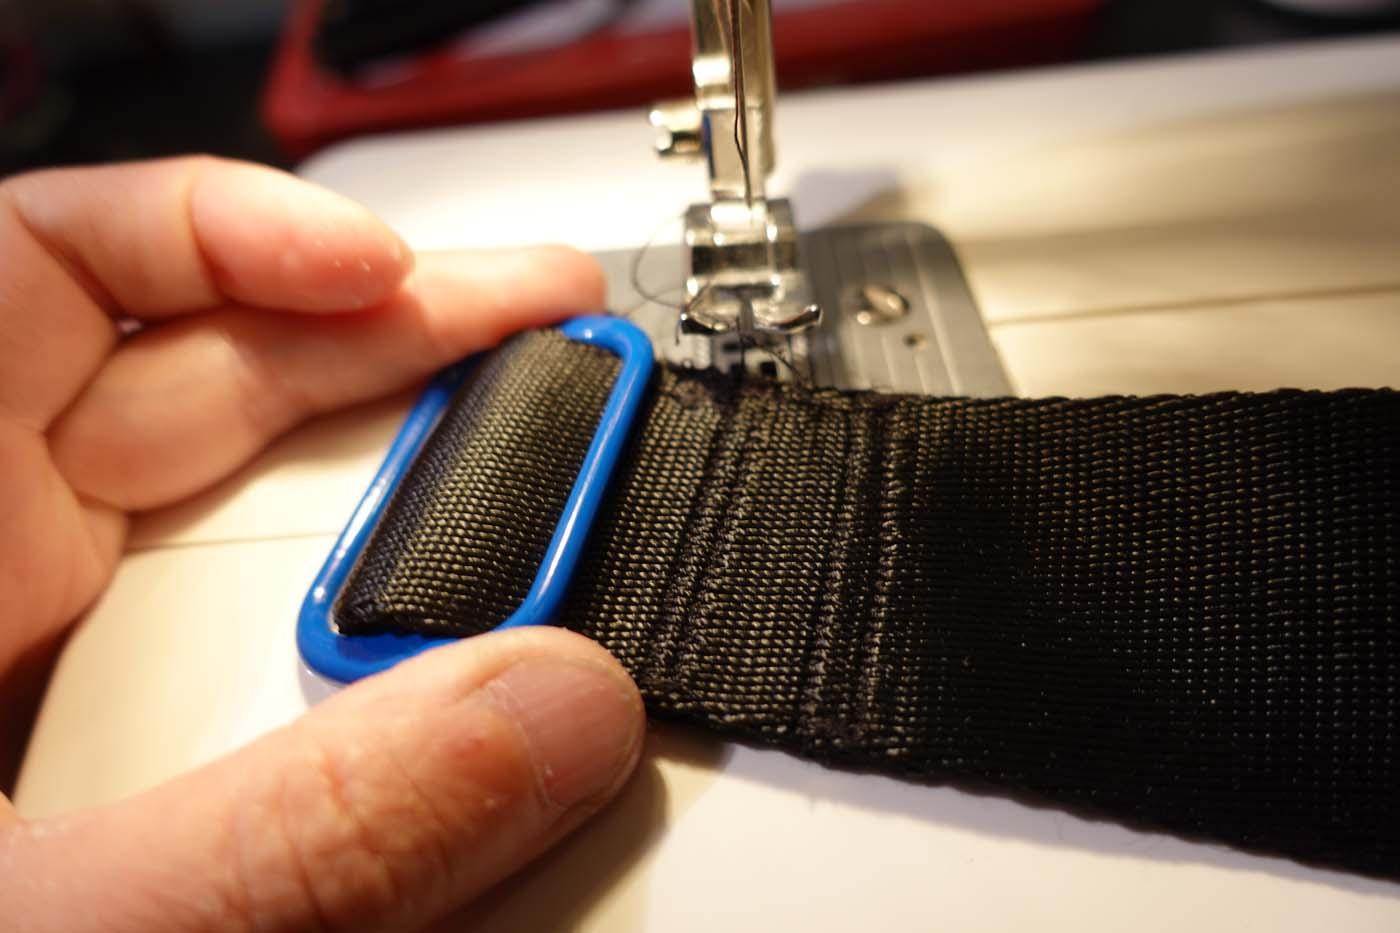 sewing a tri-glide slide